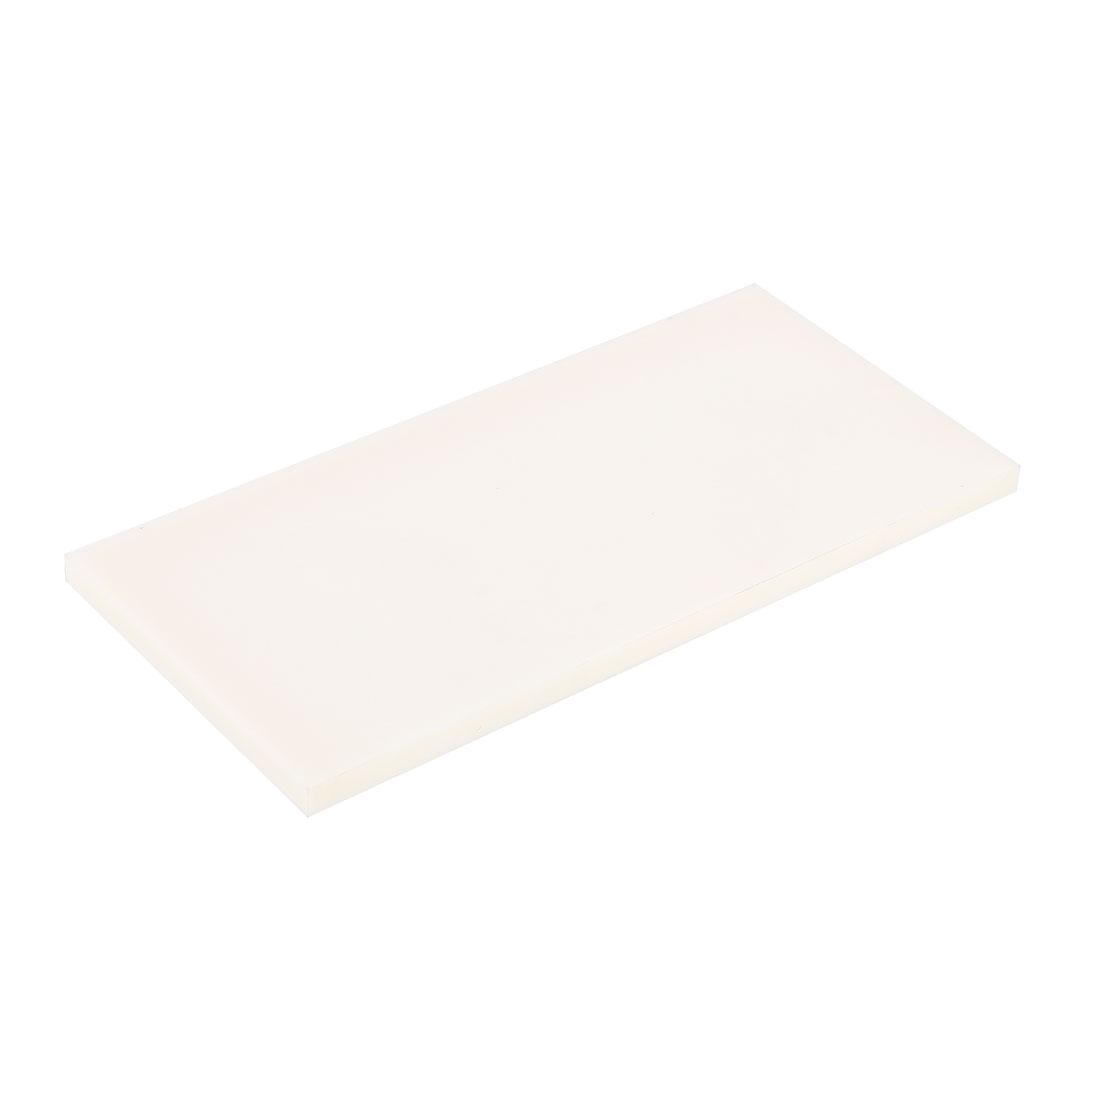 Soldering Board Ceramic Insulation Board 4 x 2 x 0.15inch/105 x 50 x 4mm